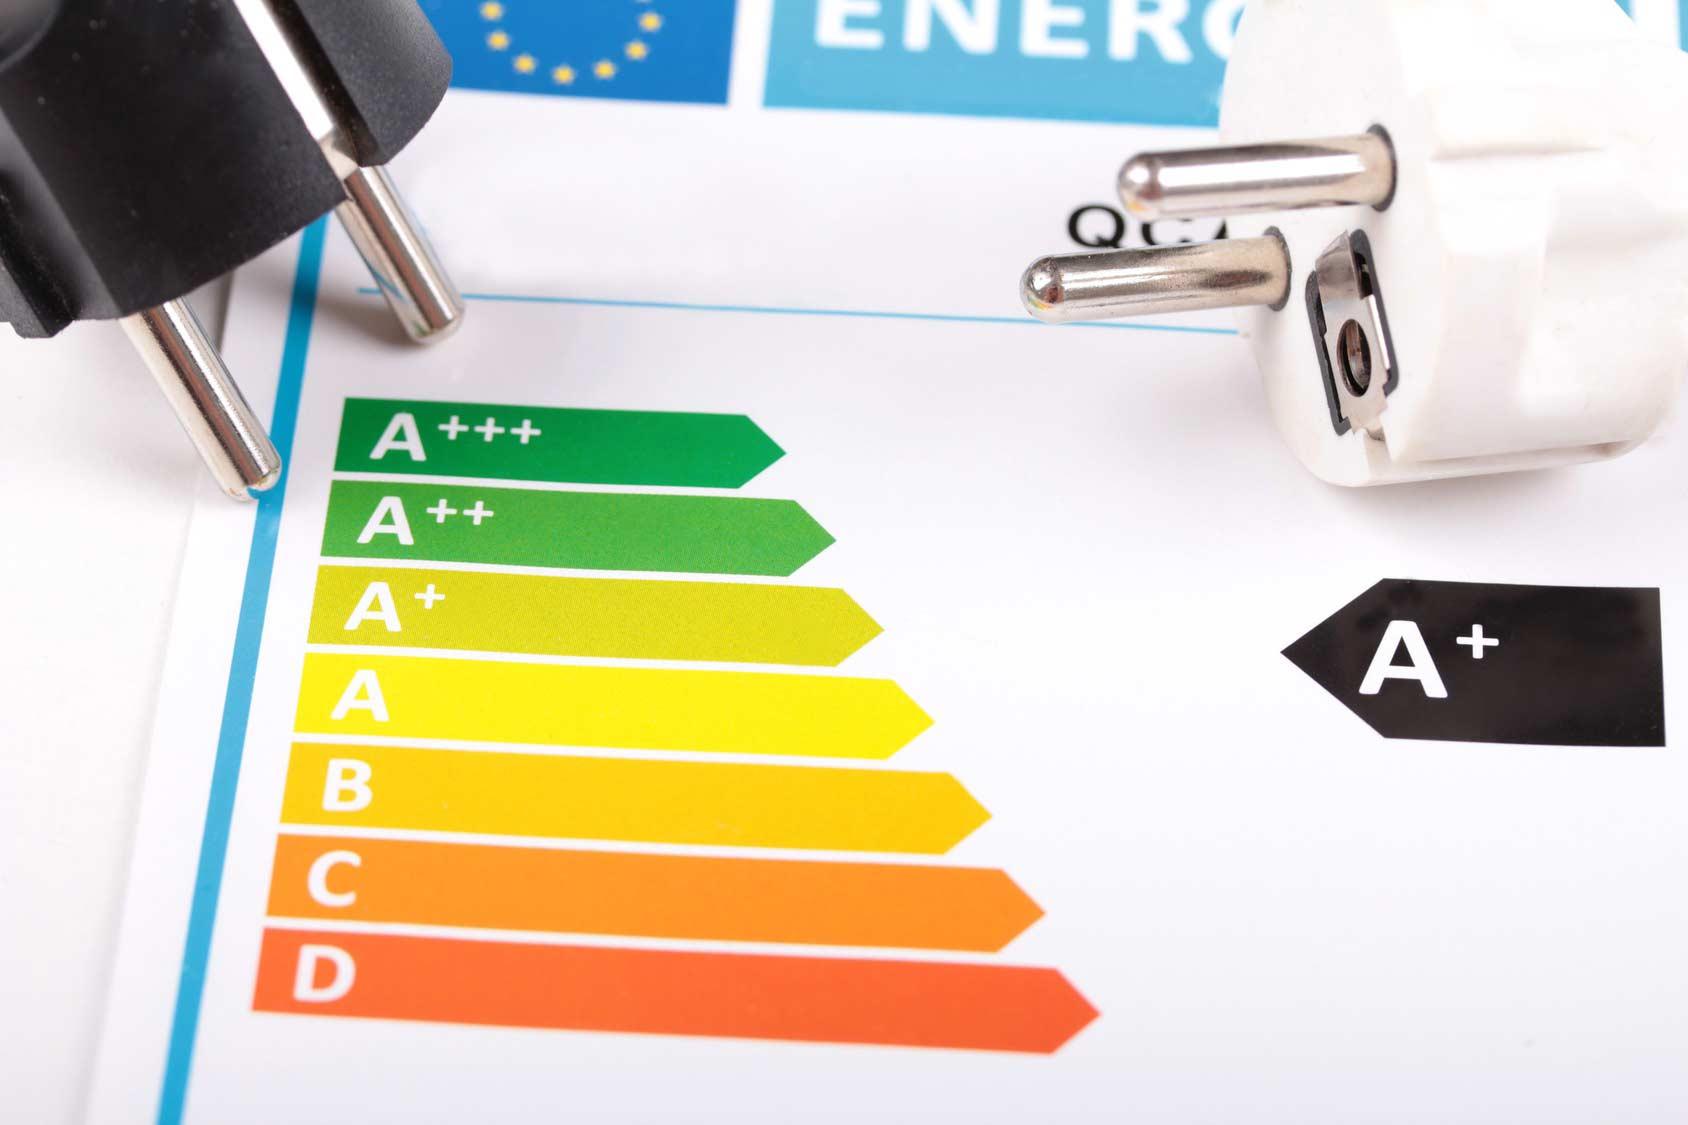 Energie label C led verlichting